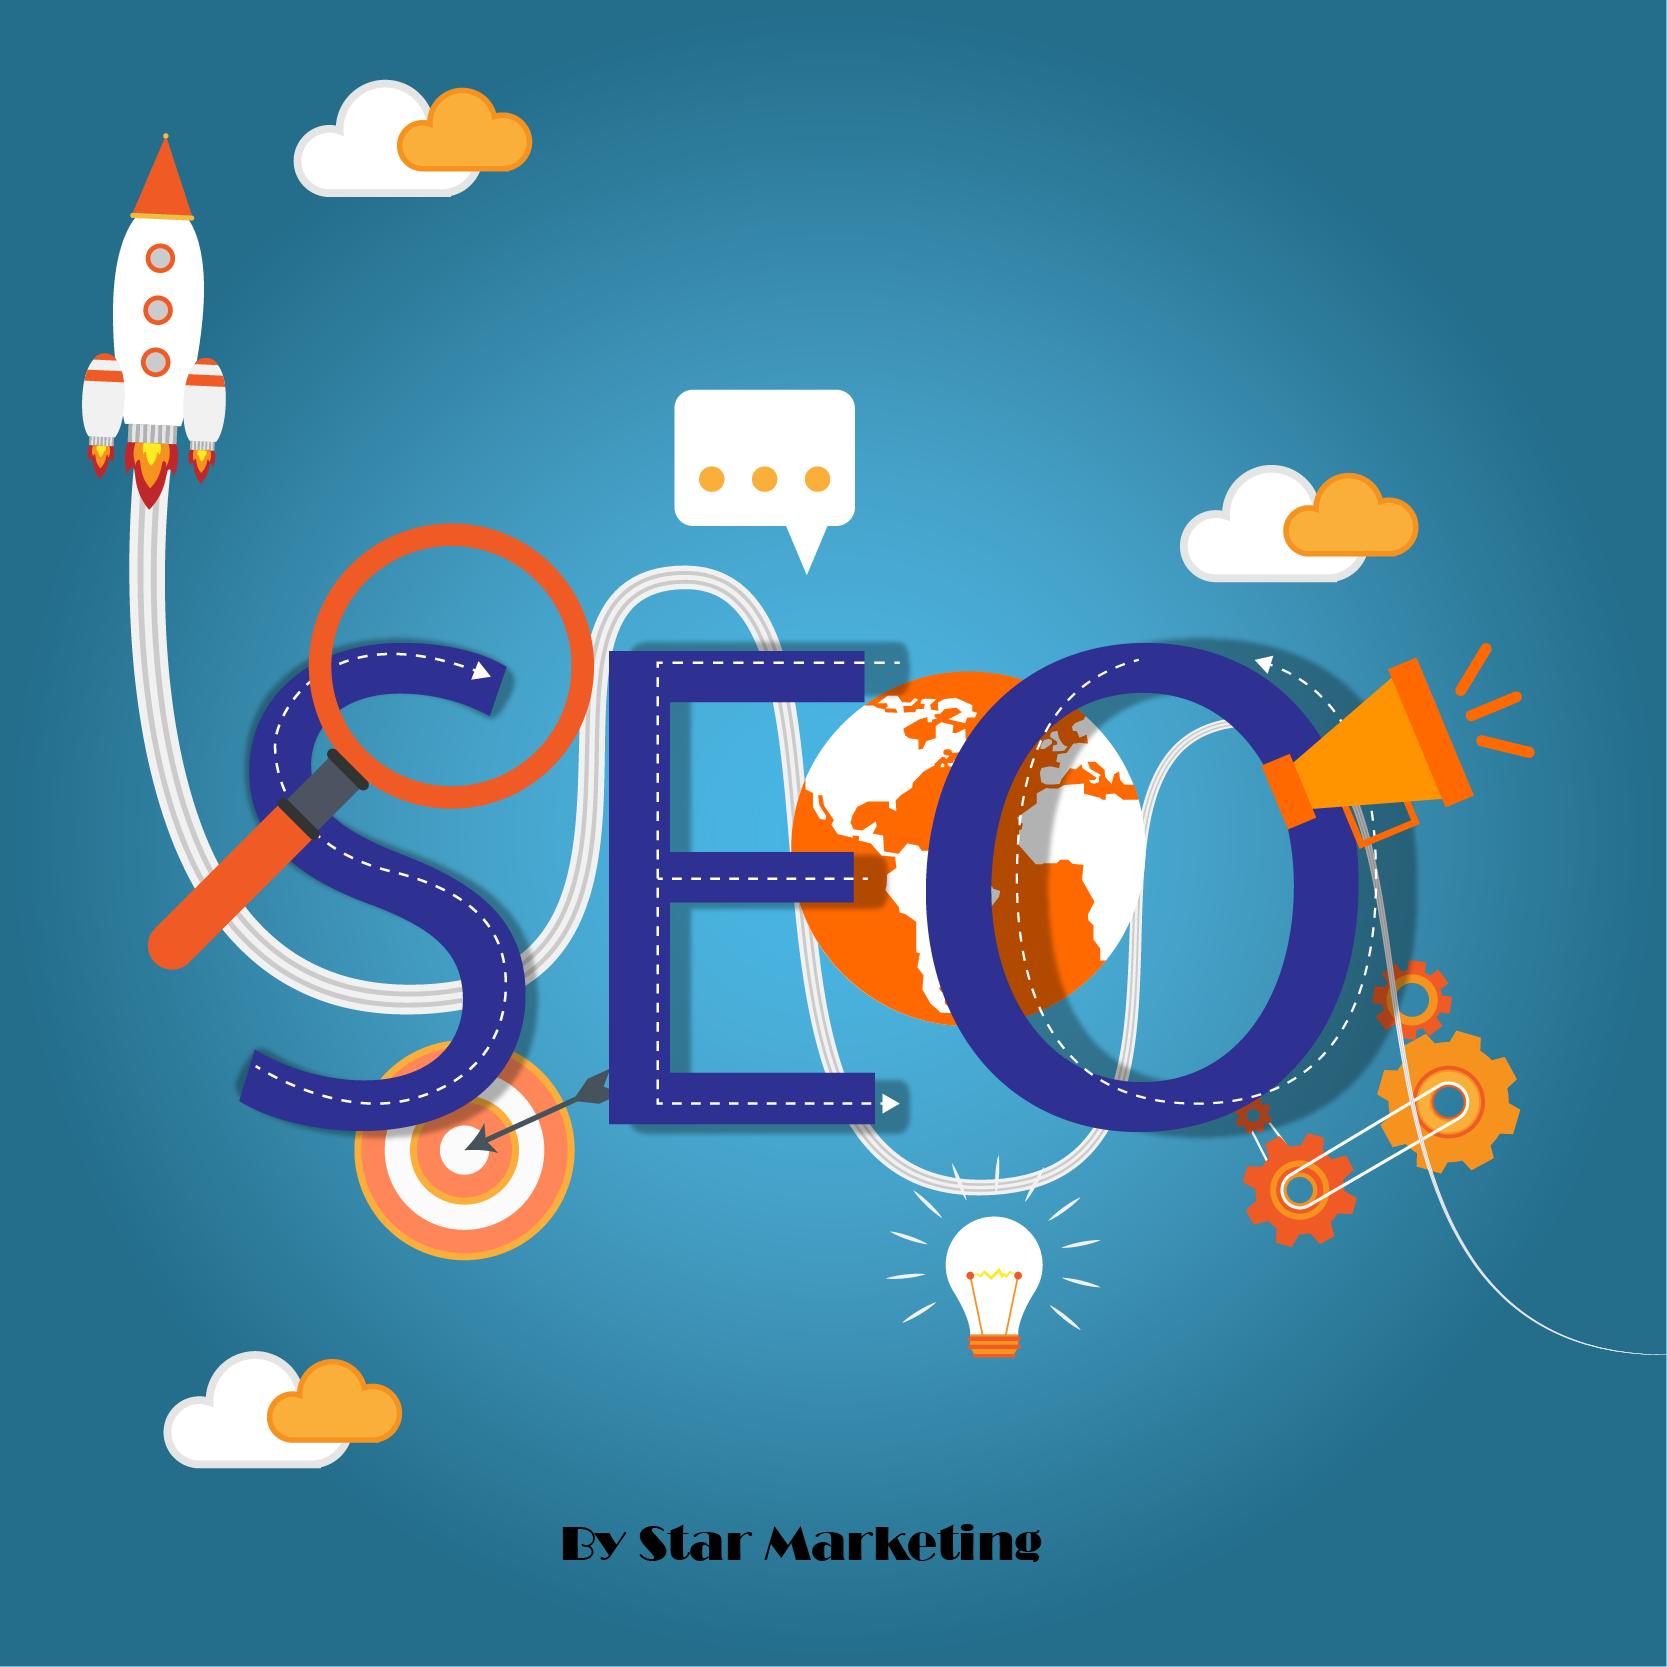 optimizare site web timisoara seo timisoara  http://star-marketing.ro/seo-timisoara